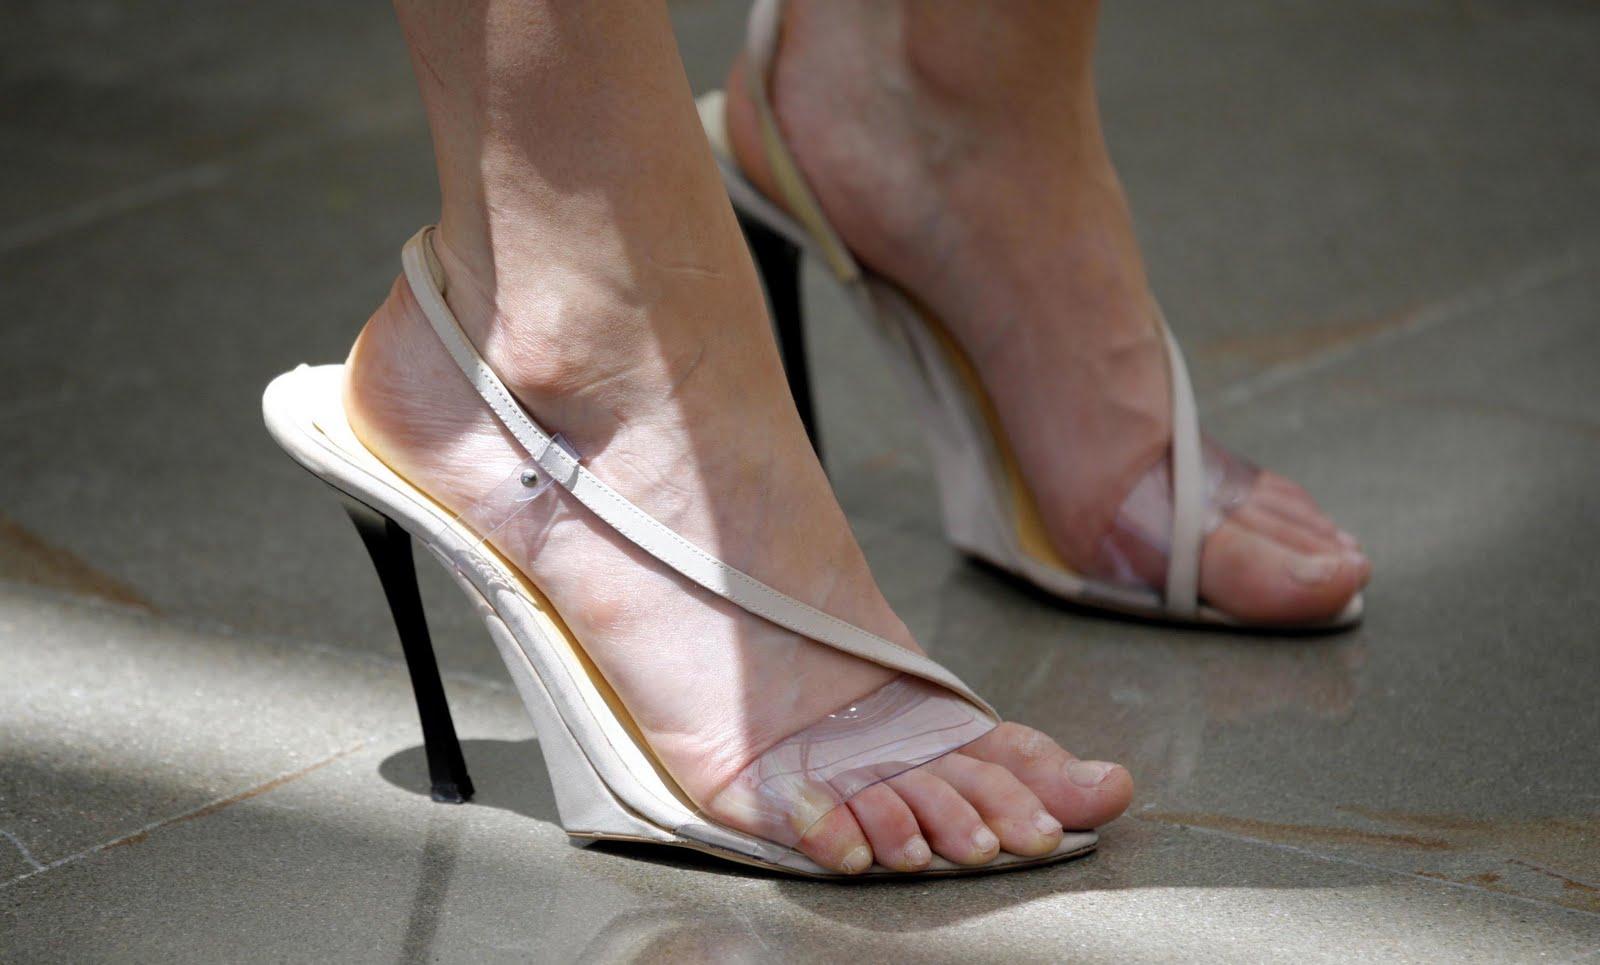 http://1.bp.blogspot.com/_UaLWp72nij4/S7uO3l8lzUI/AAAAAAAAGaQ/1ms8i1BZUrg/s1600/emily-deschanel-feet-4.jpg